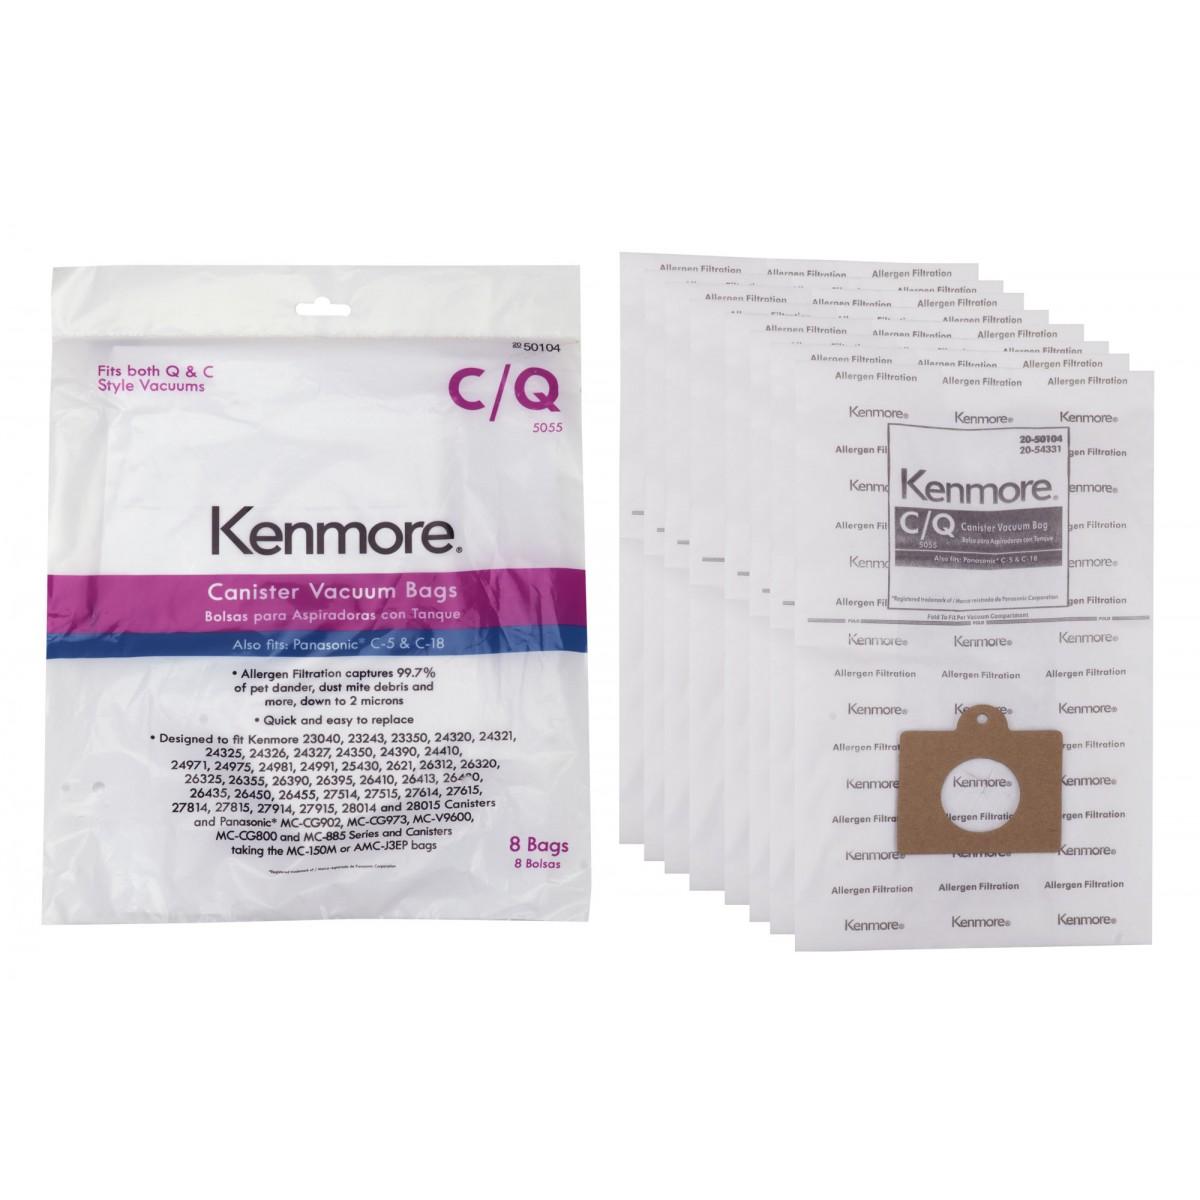 50104 5055 Q; Panasonic C-5 /& C-18 8 Pack Kenmore Canister Vacuum Bag for C